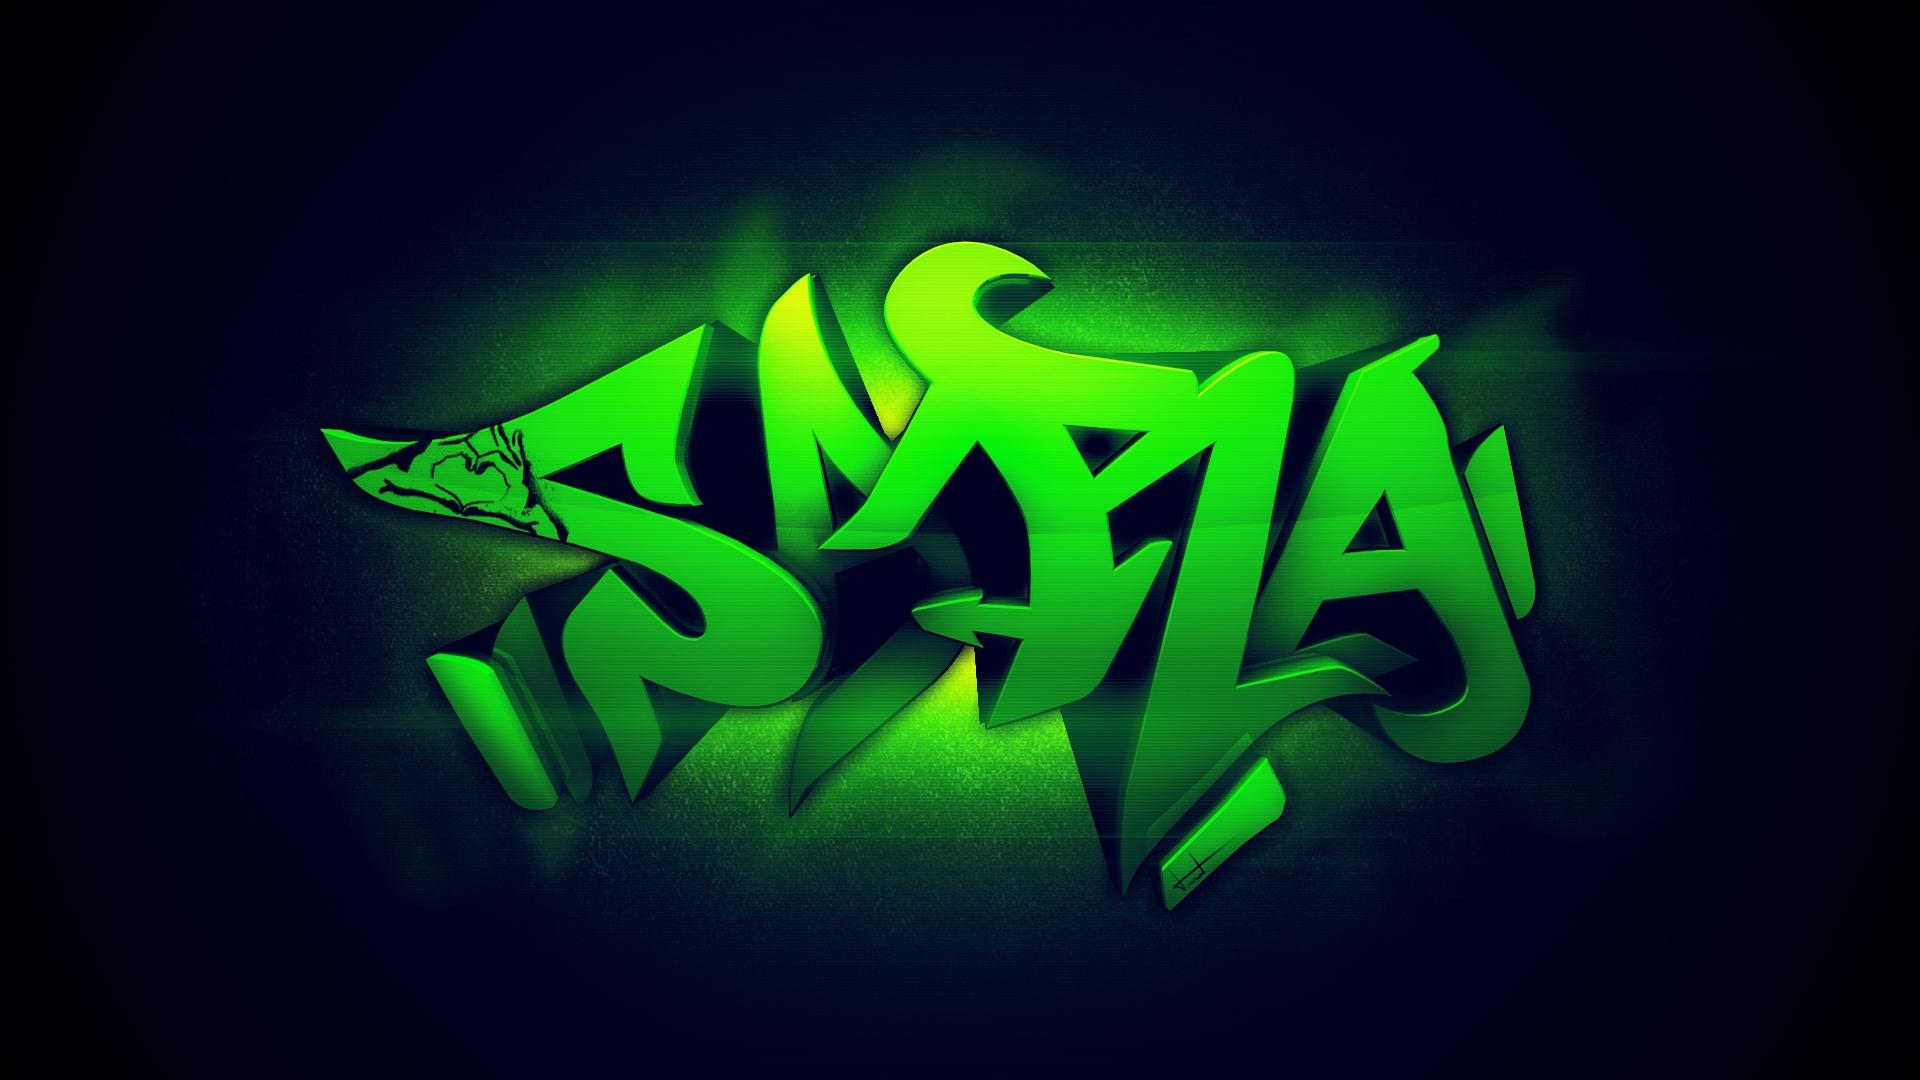 Neon Green Graffiti Www Pixshark Com Images Galleries